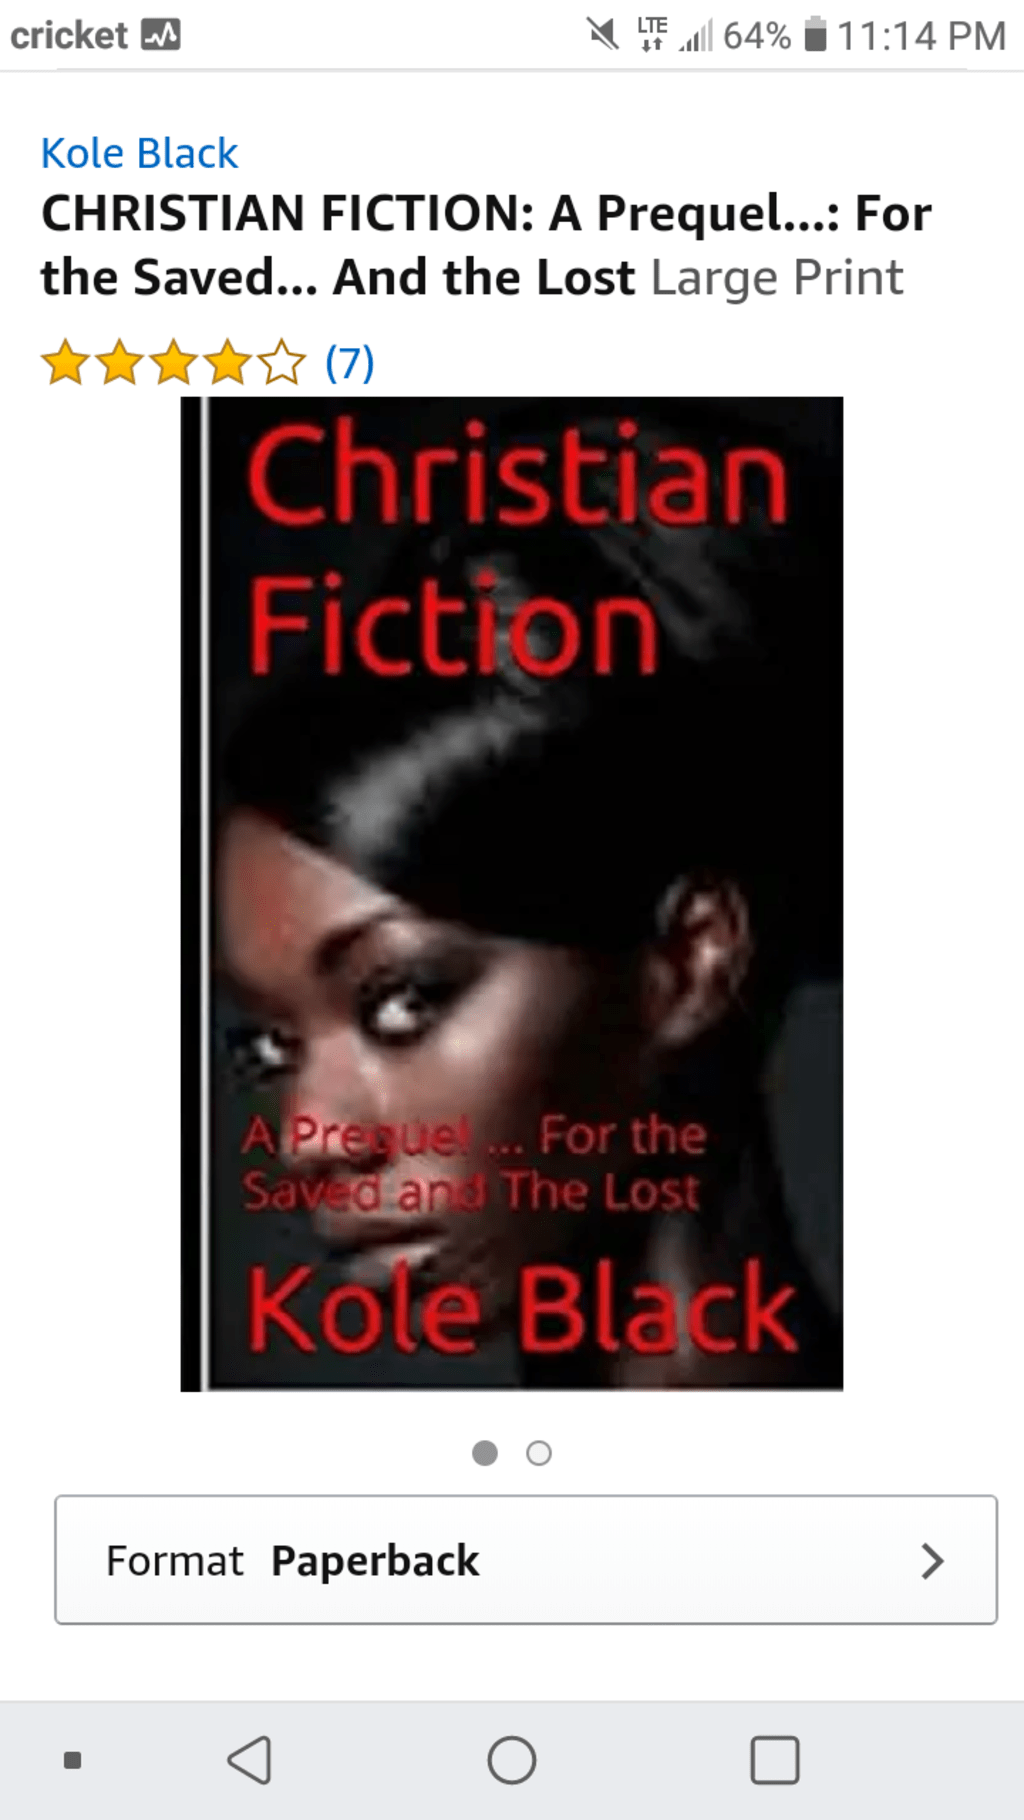 Christian Fiction (Domestic Violence)